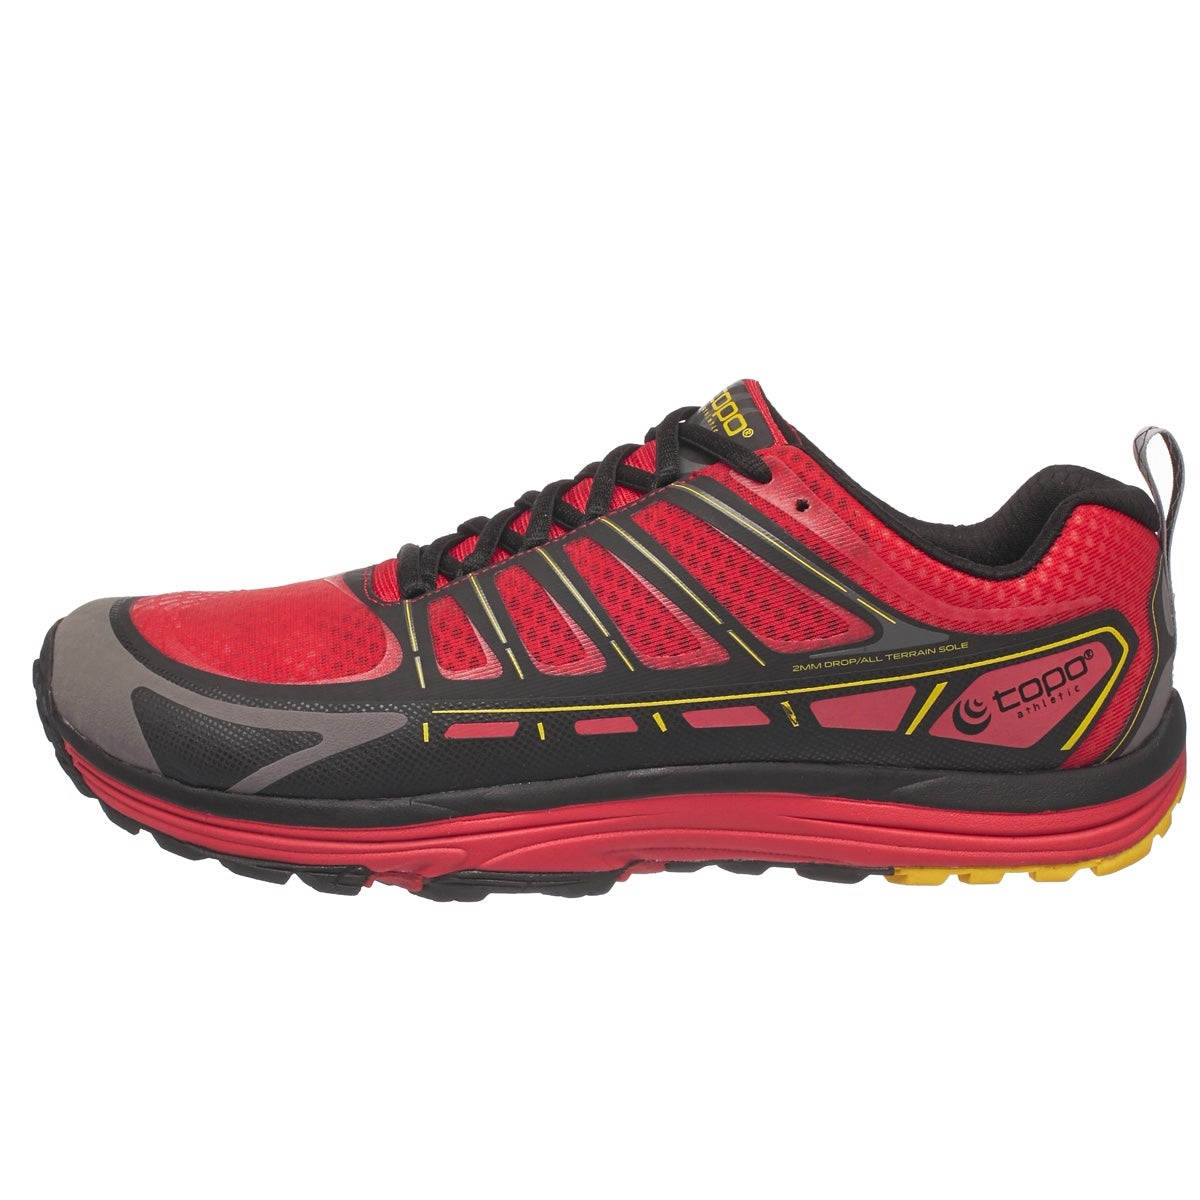 Running Shoes Warehouse Europe